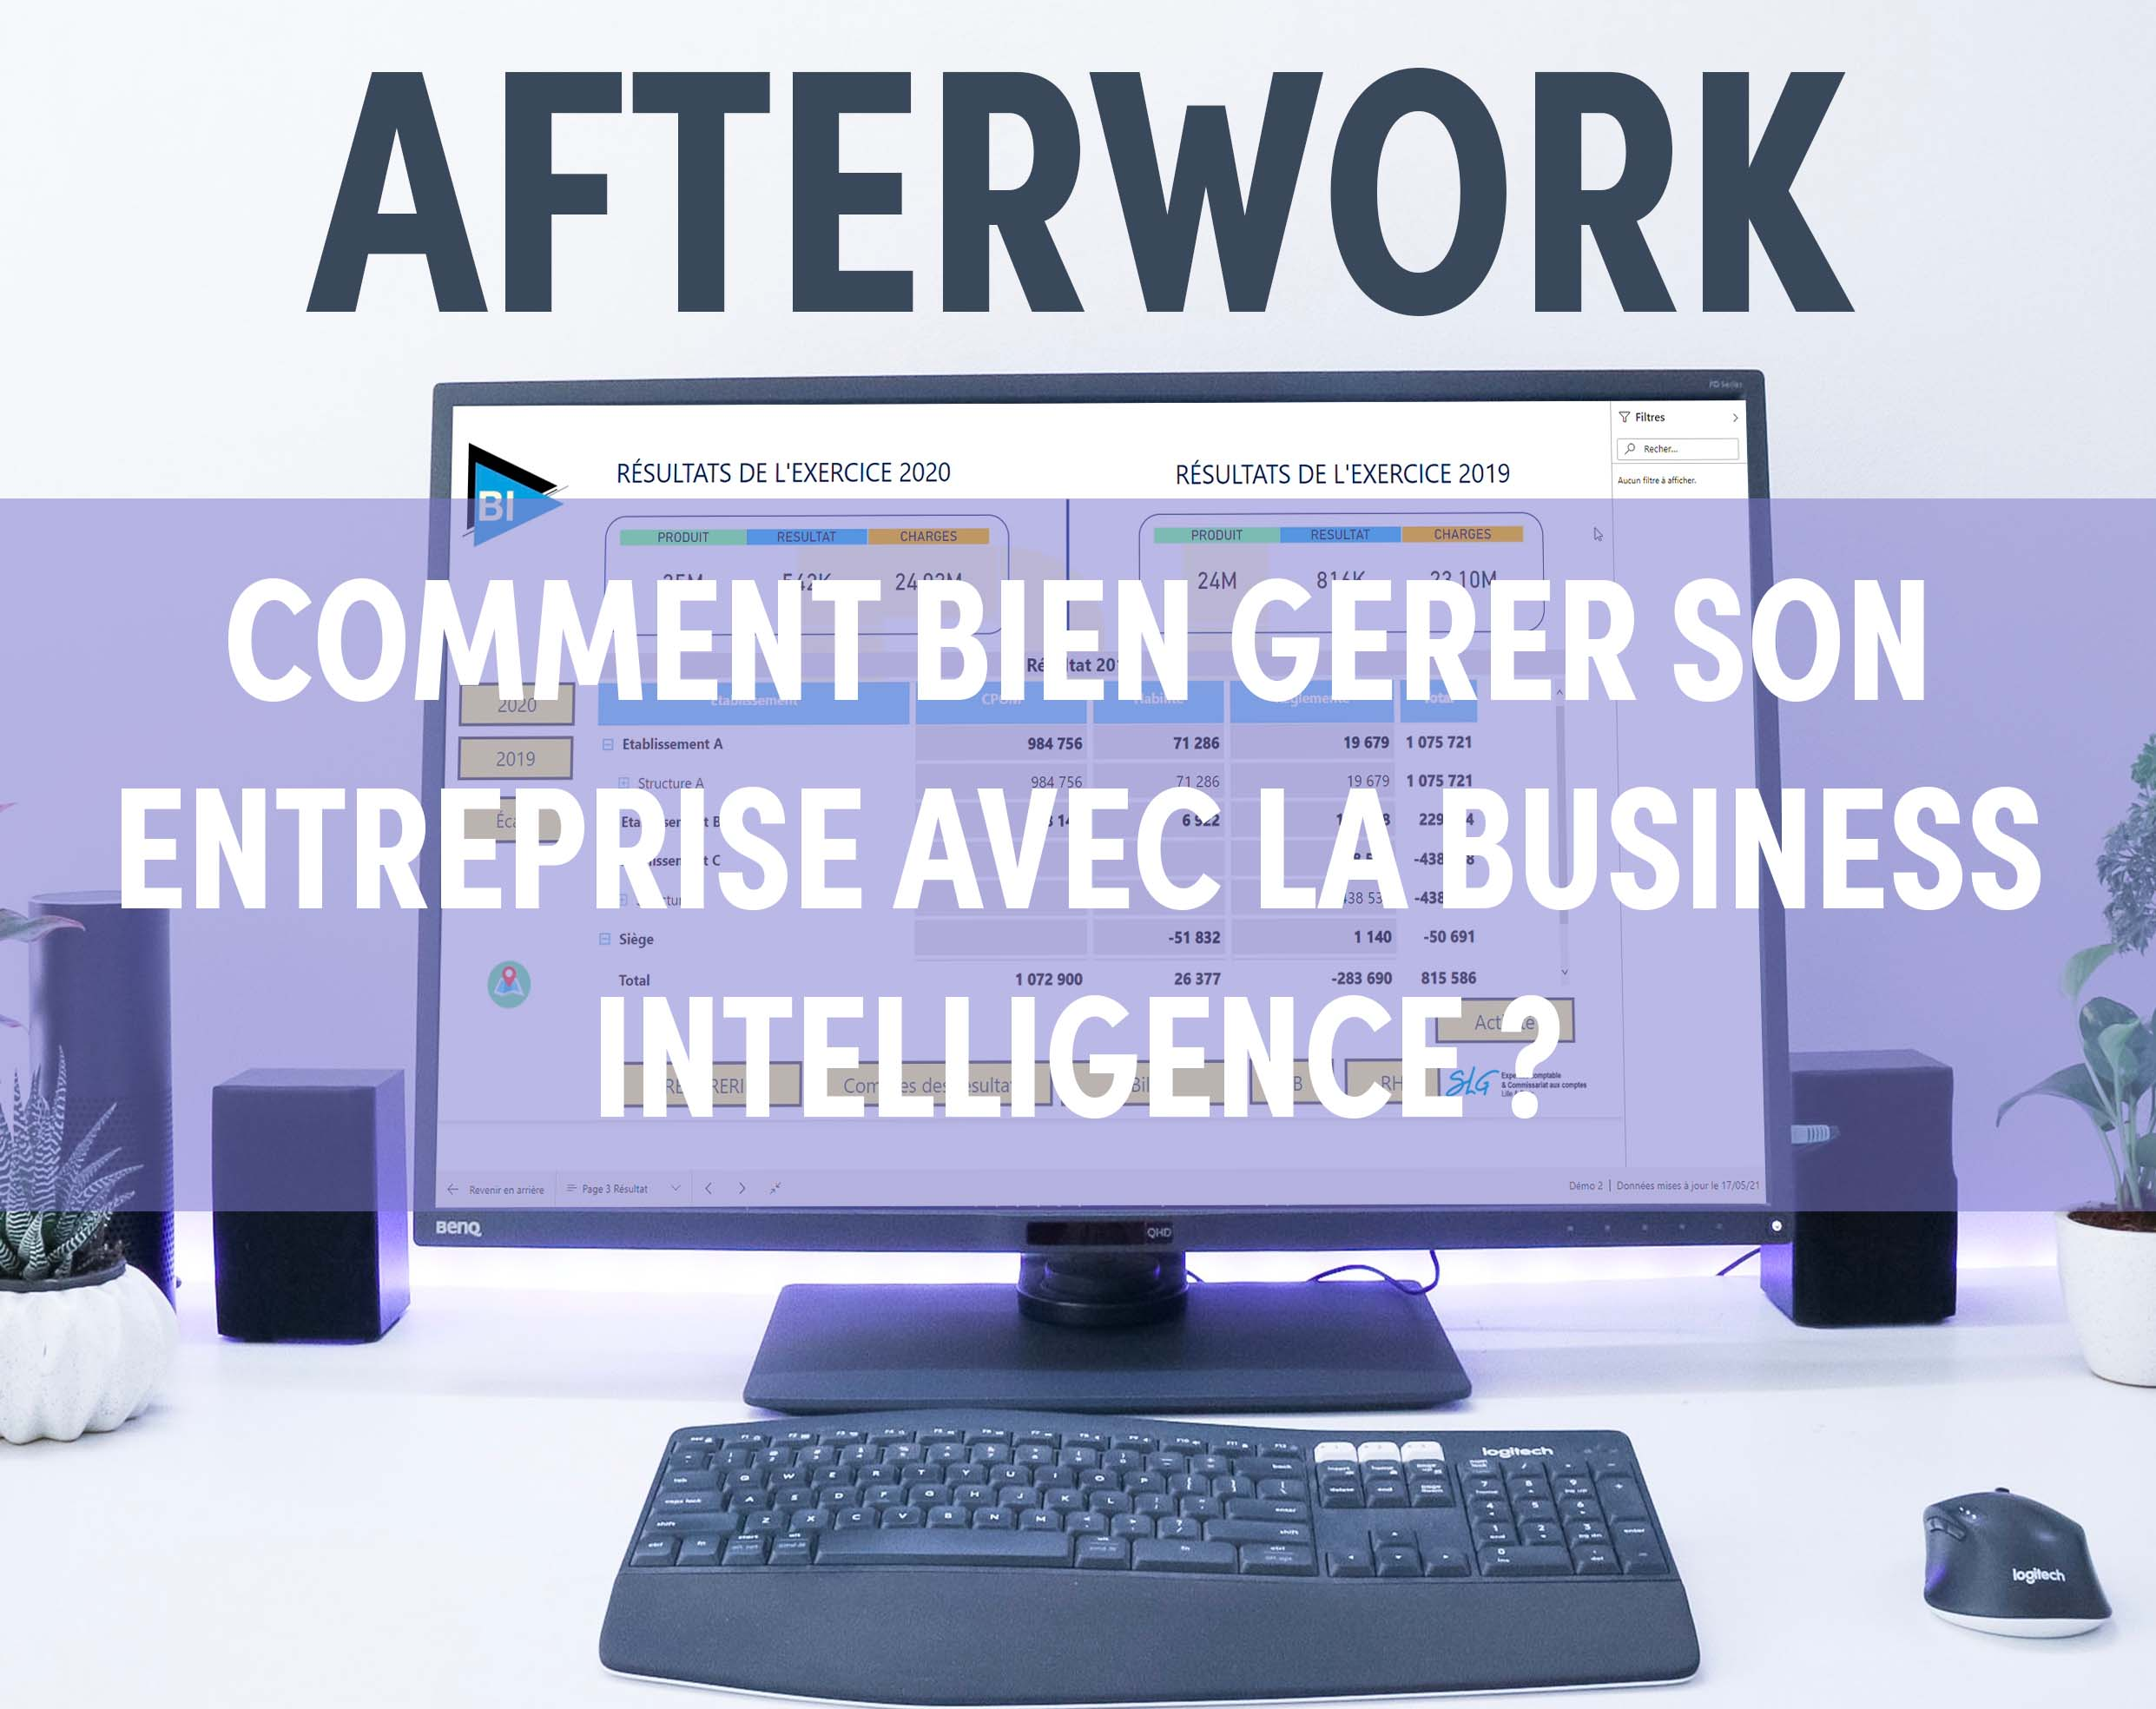 AFTERWORK BUSINESS INTELLIGENCE – COMMENT BIEN GERER SON ENTREPRISE AVEC LA BI ?